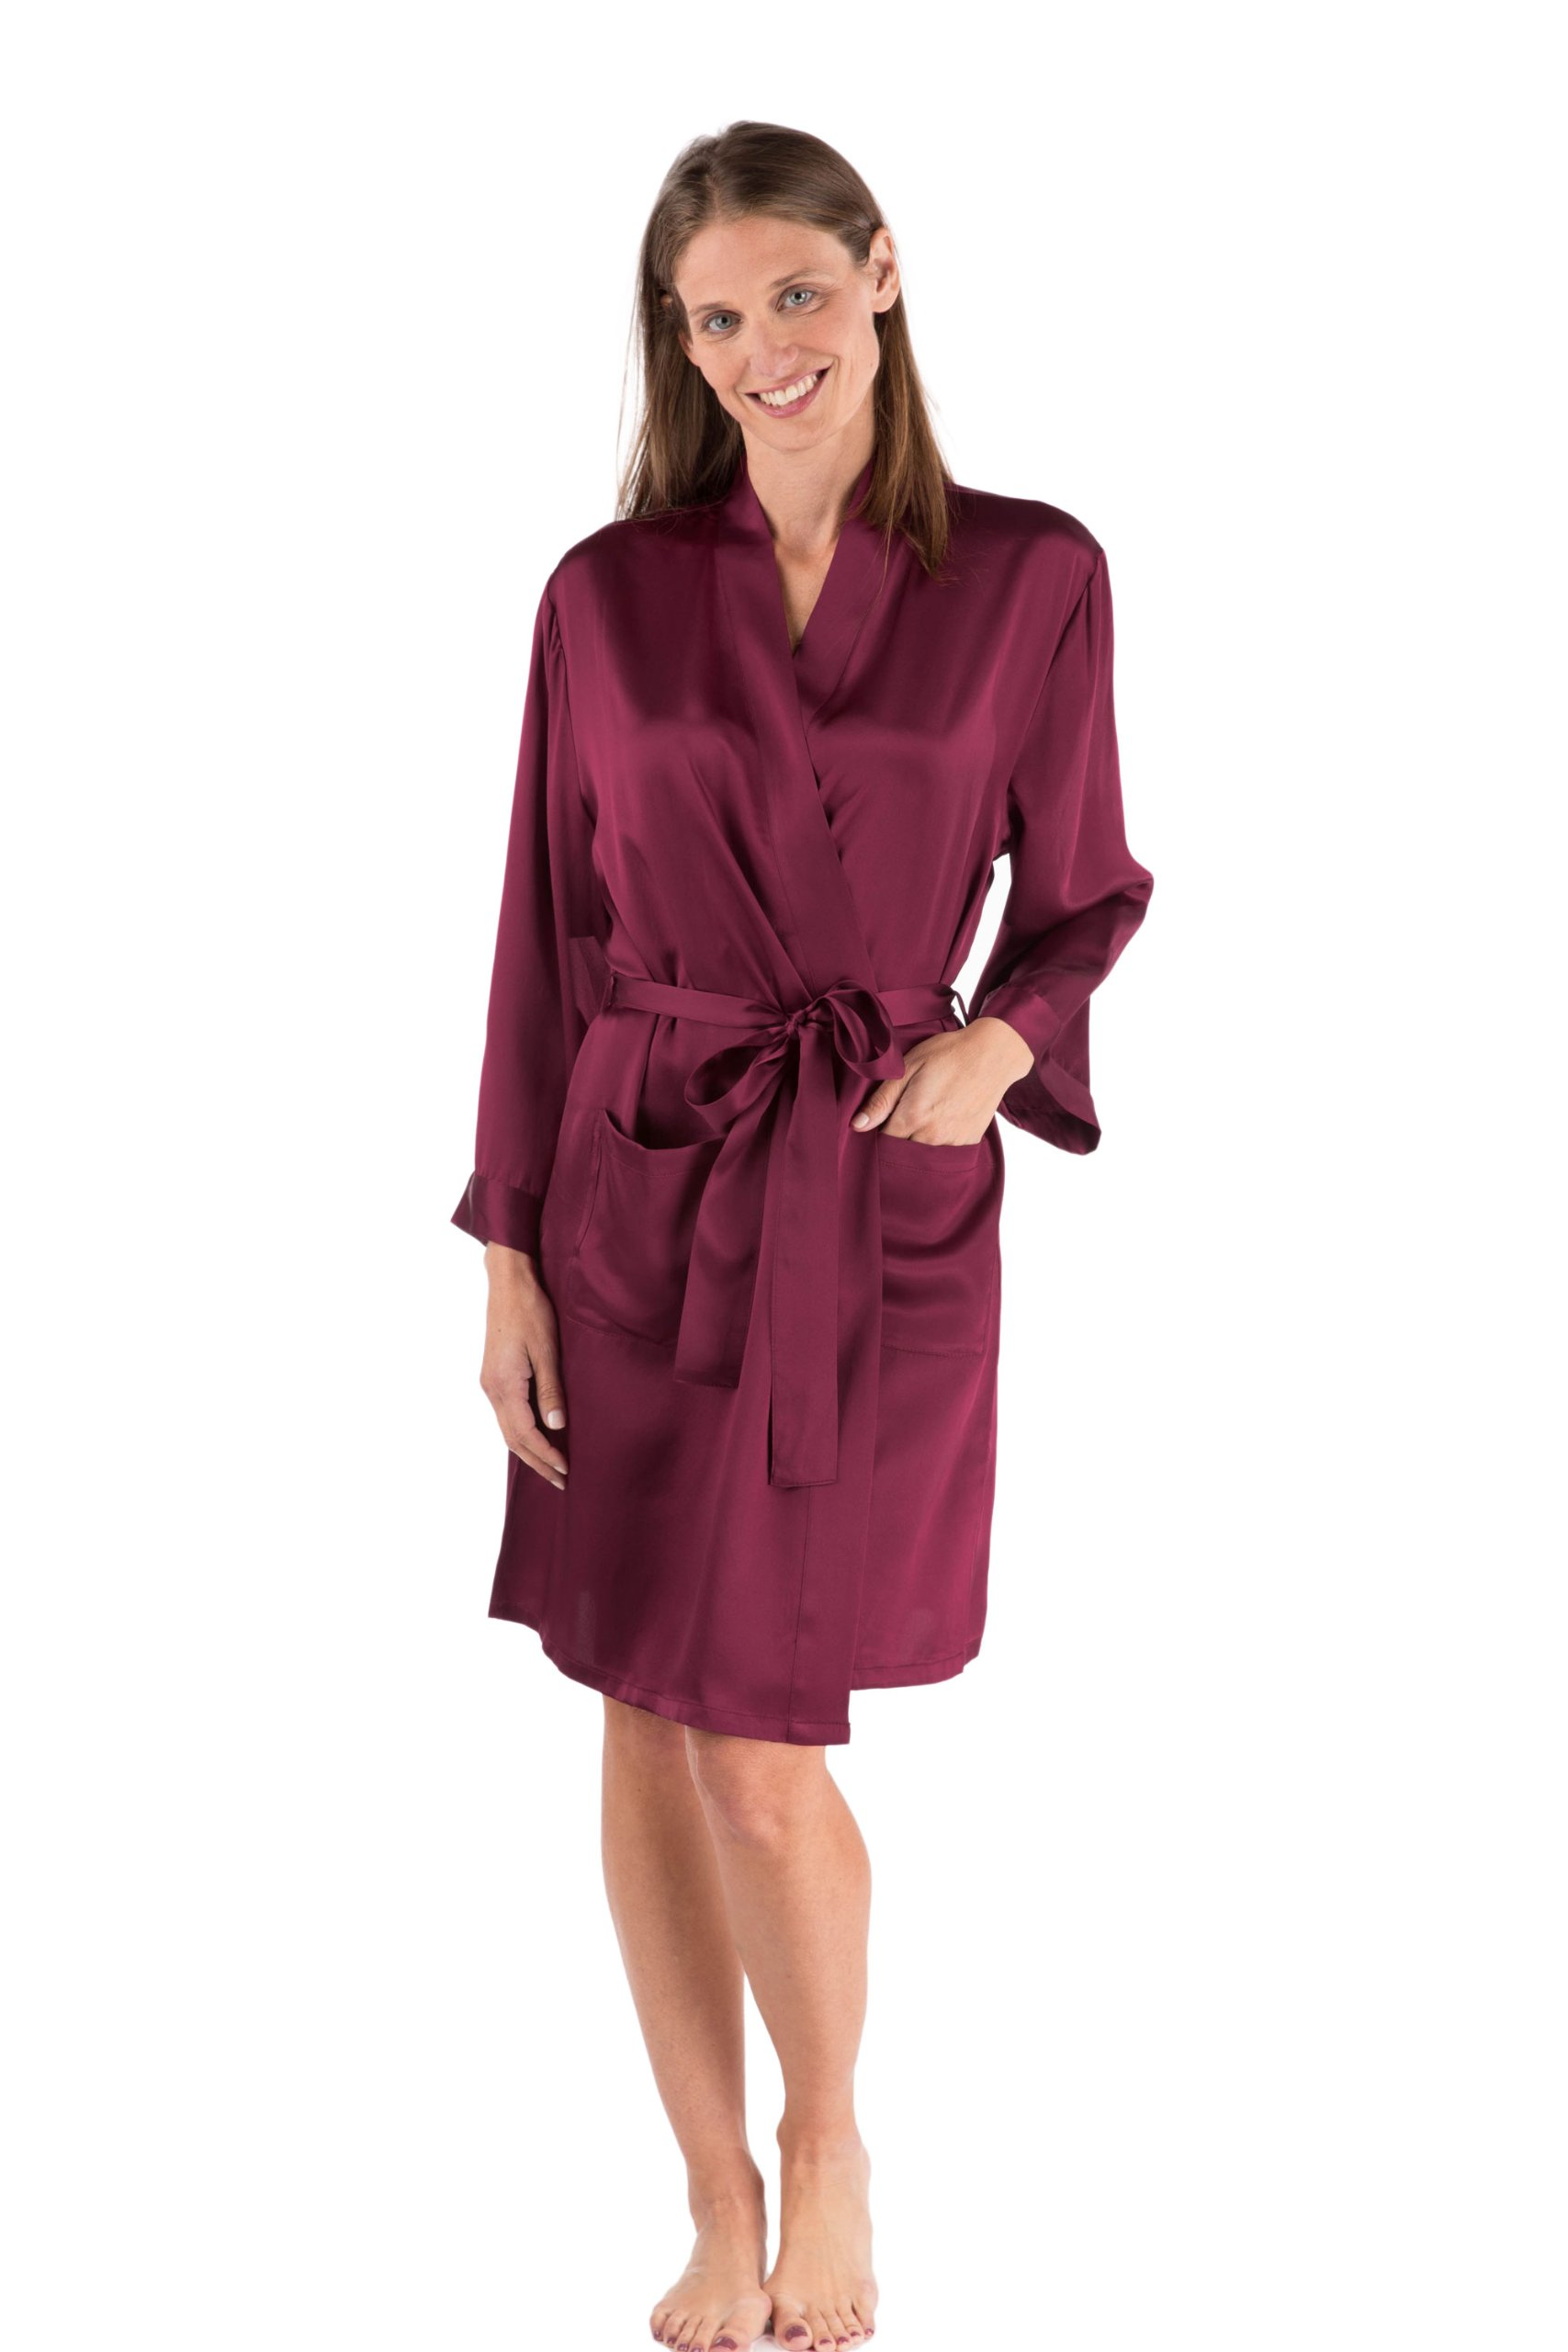 TexereSilk Women's Short Silk Bathrobe (Wine, Small/Medium) Great Gifts for Bridal Shower WS0105-WNE-SM